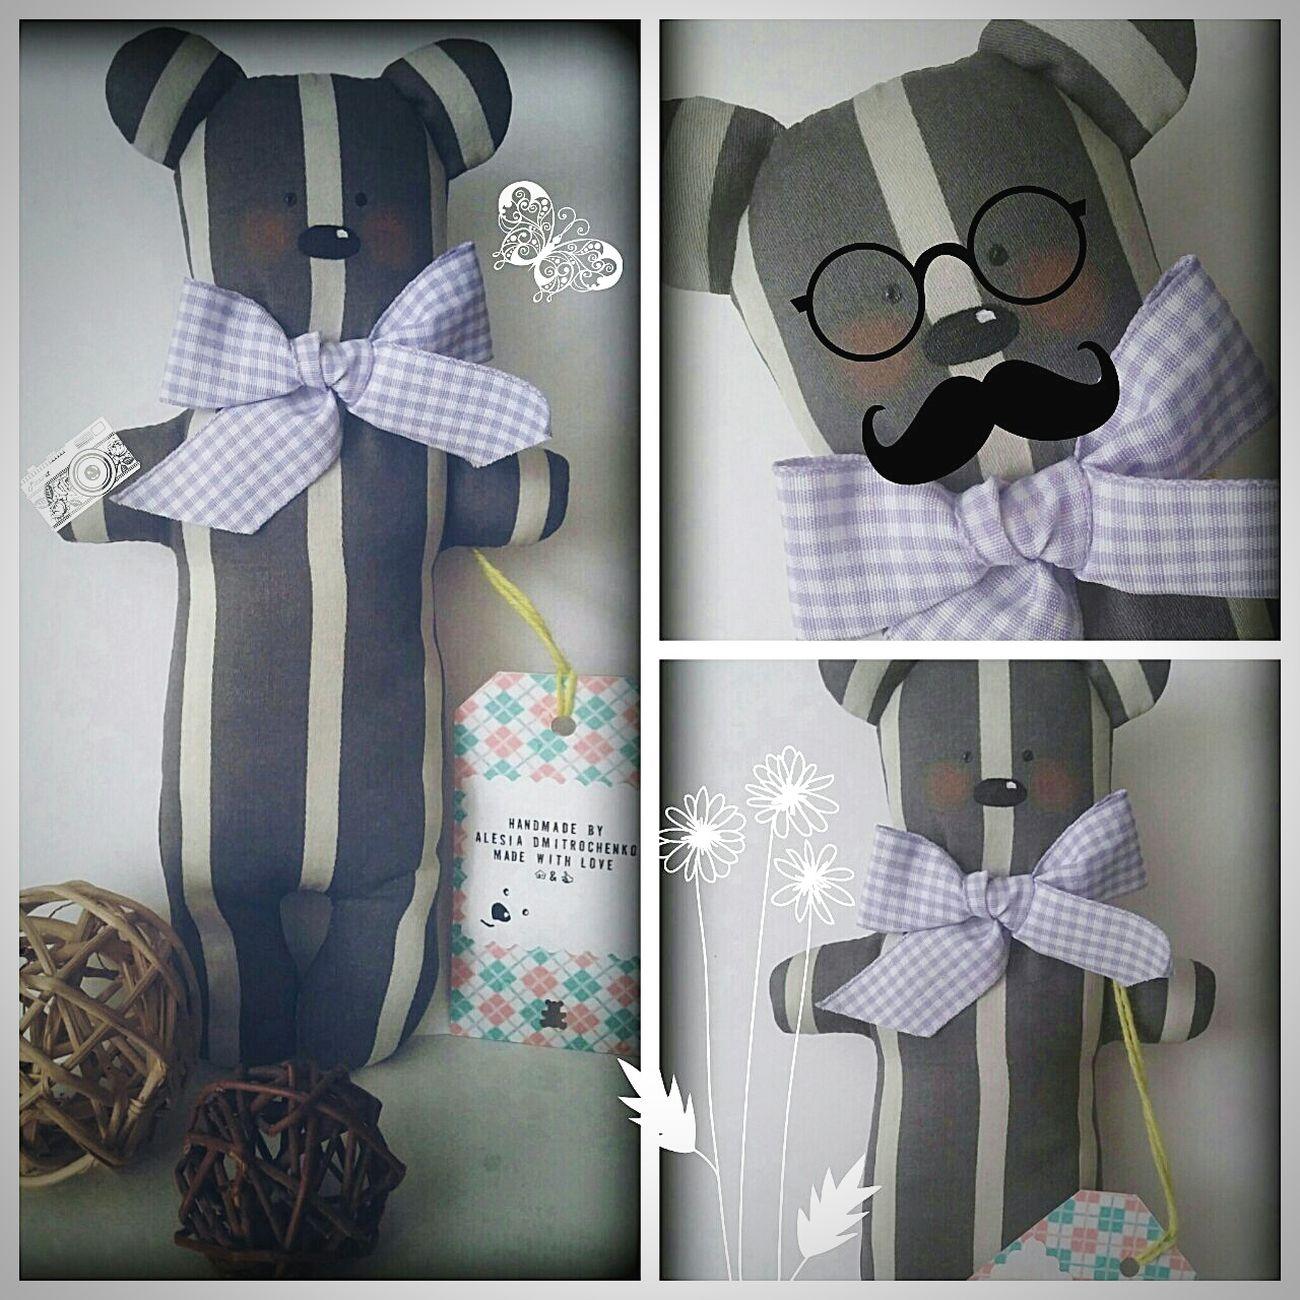 Textile Design Textile Production Bear Handmade Wow!!😋 MyWorld ♡ Beautiful ♥ My Work Hand Made Handmadewithlove Handmade By Me Hand Made Shop Hand Made Toys Toys Toys Collection My Handmade Work Textileart Textile Art